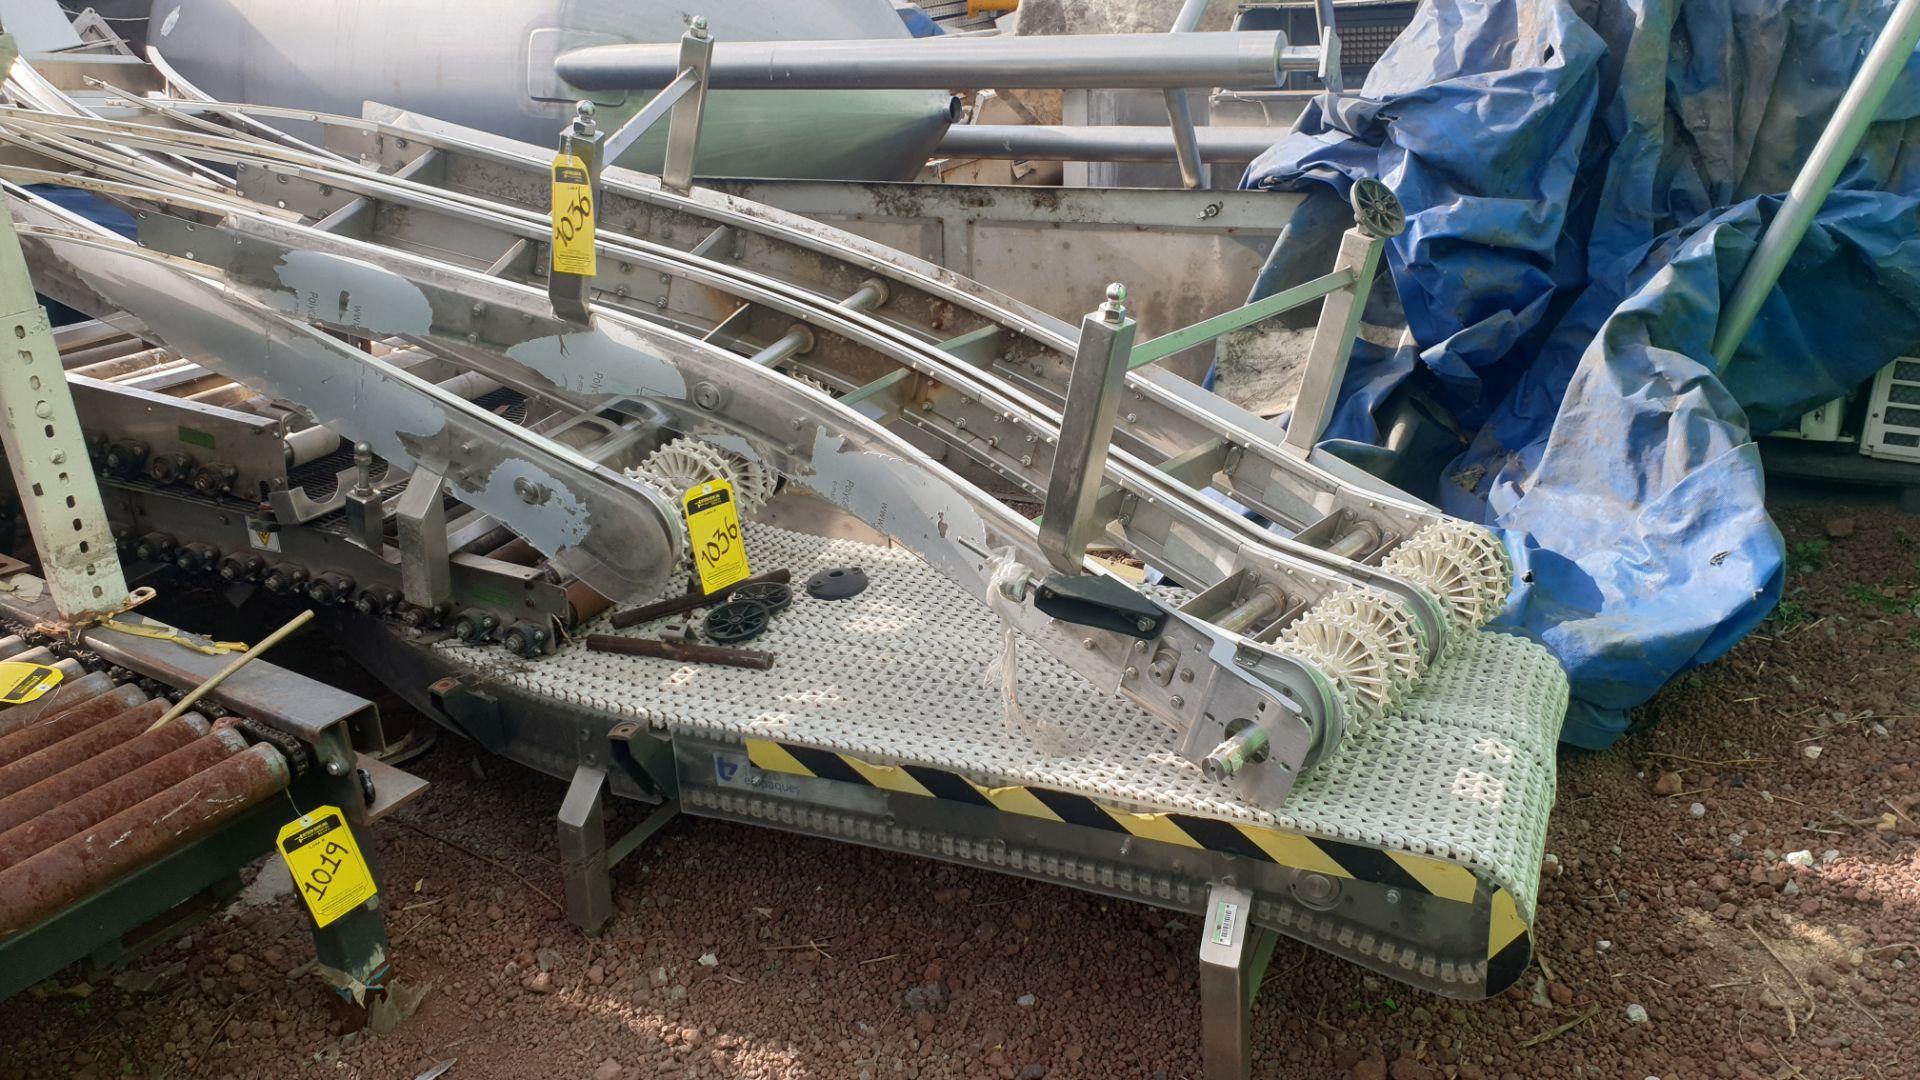 S conveyor belt batch. Please inspect - Image 6 of 9